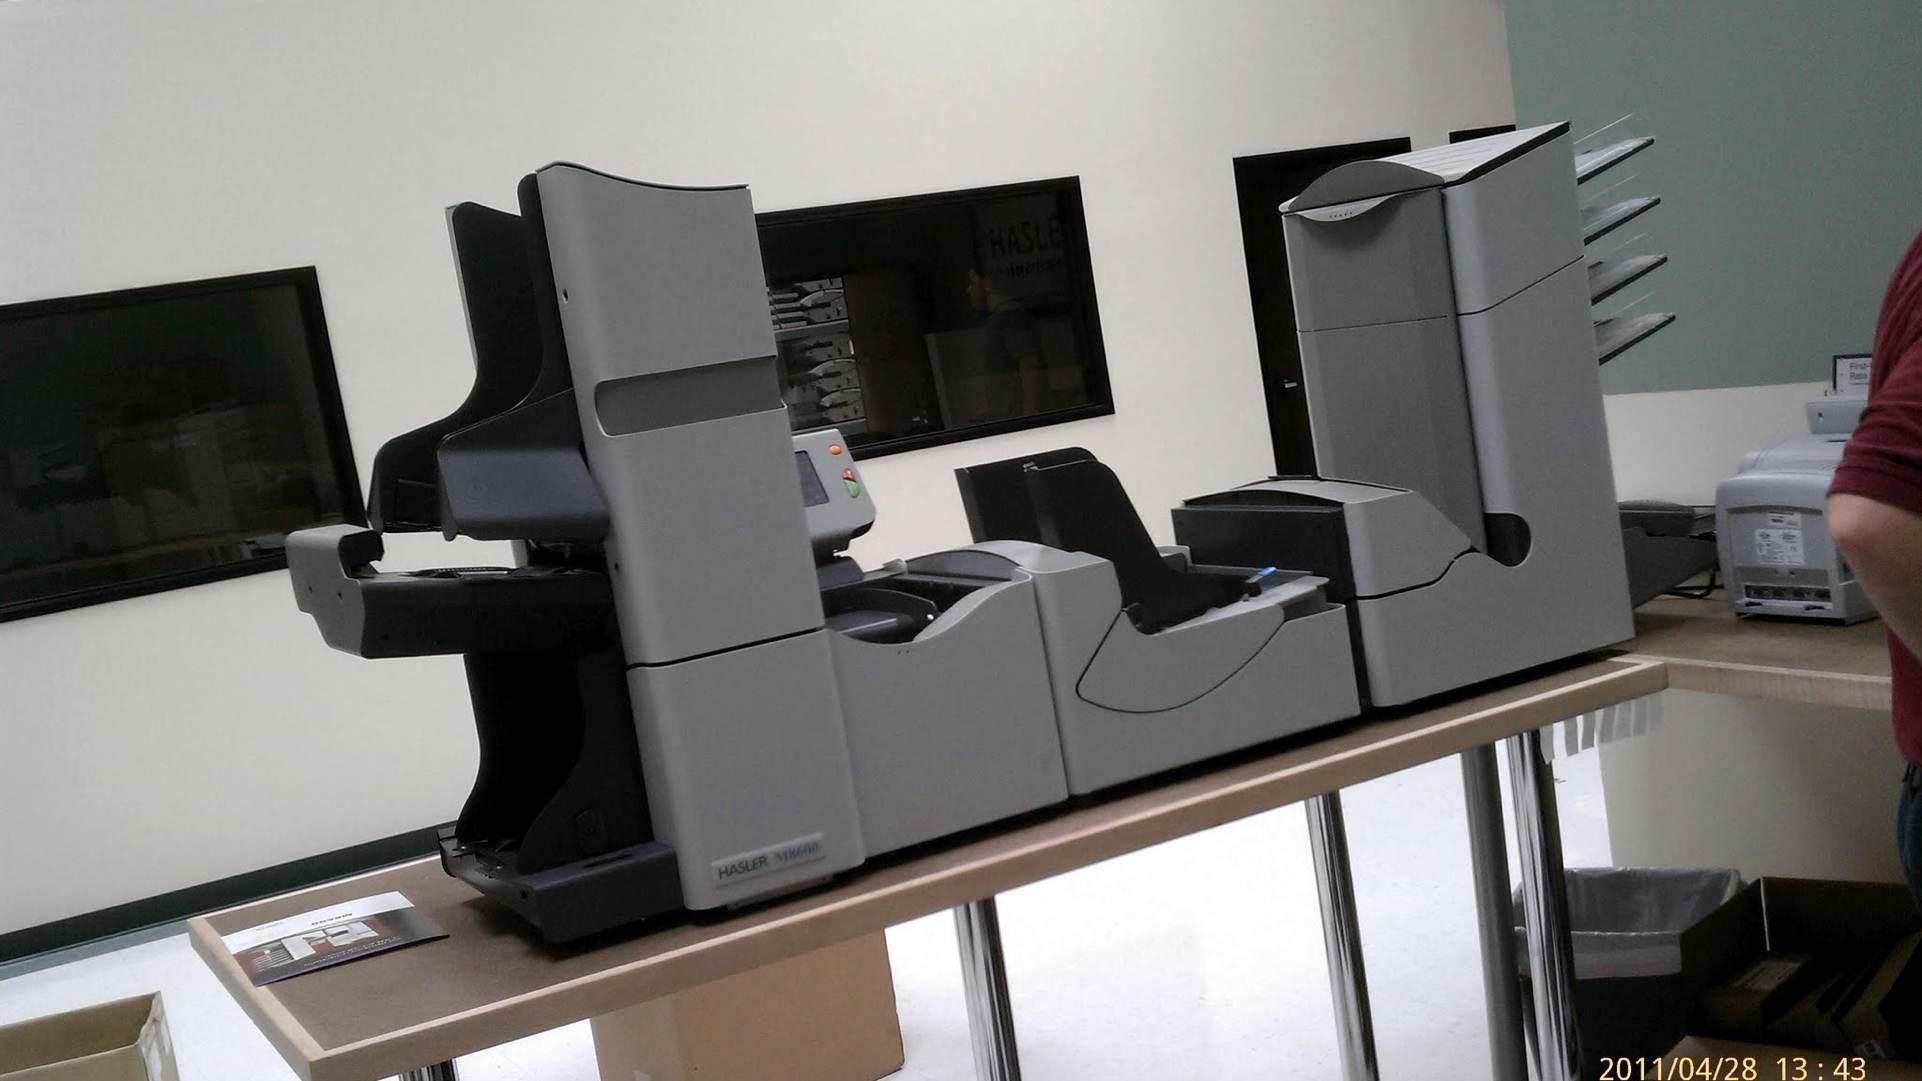 Large folder/sorter mailing machine.